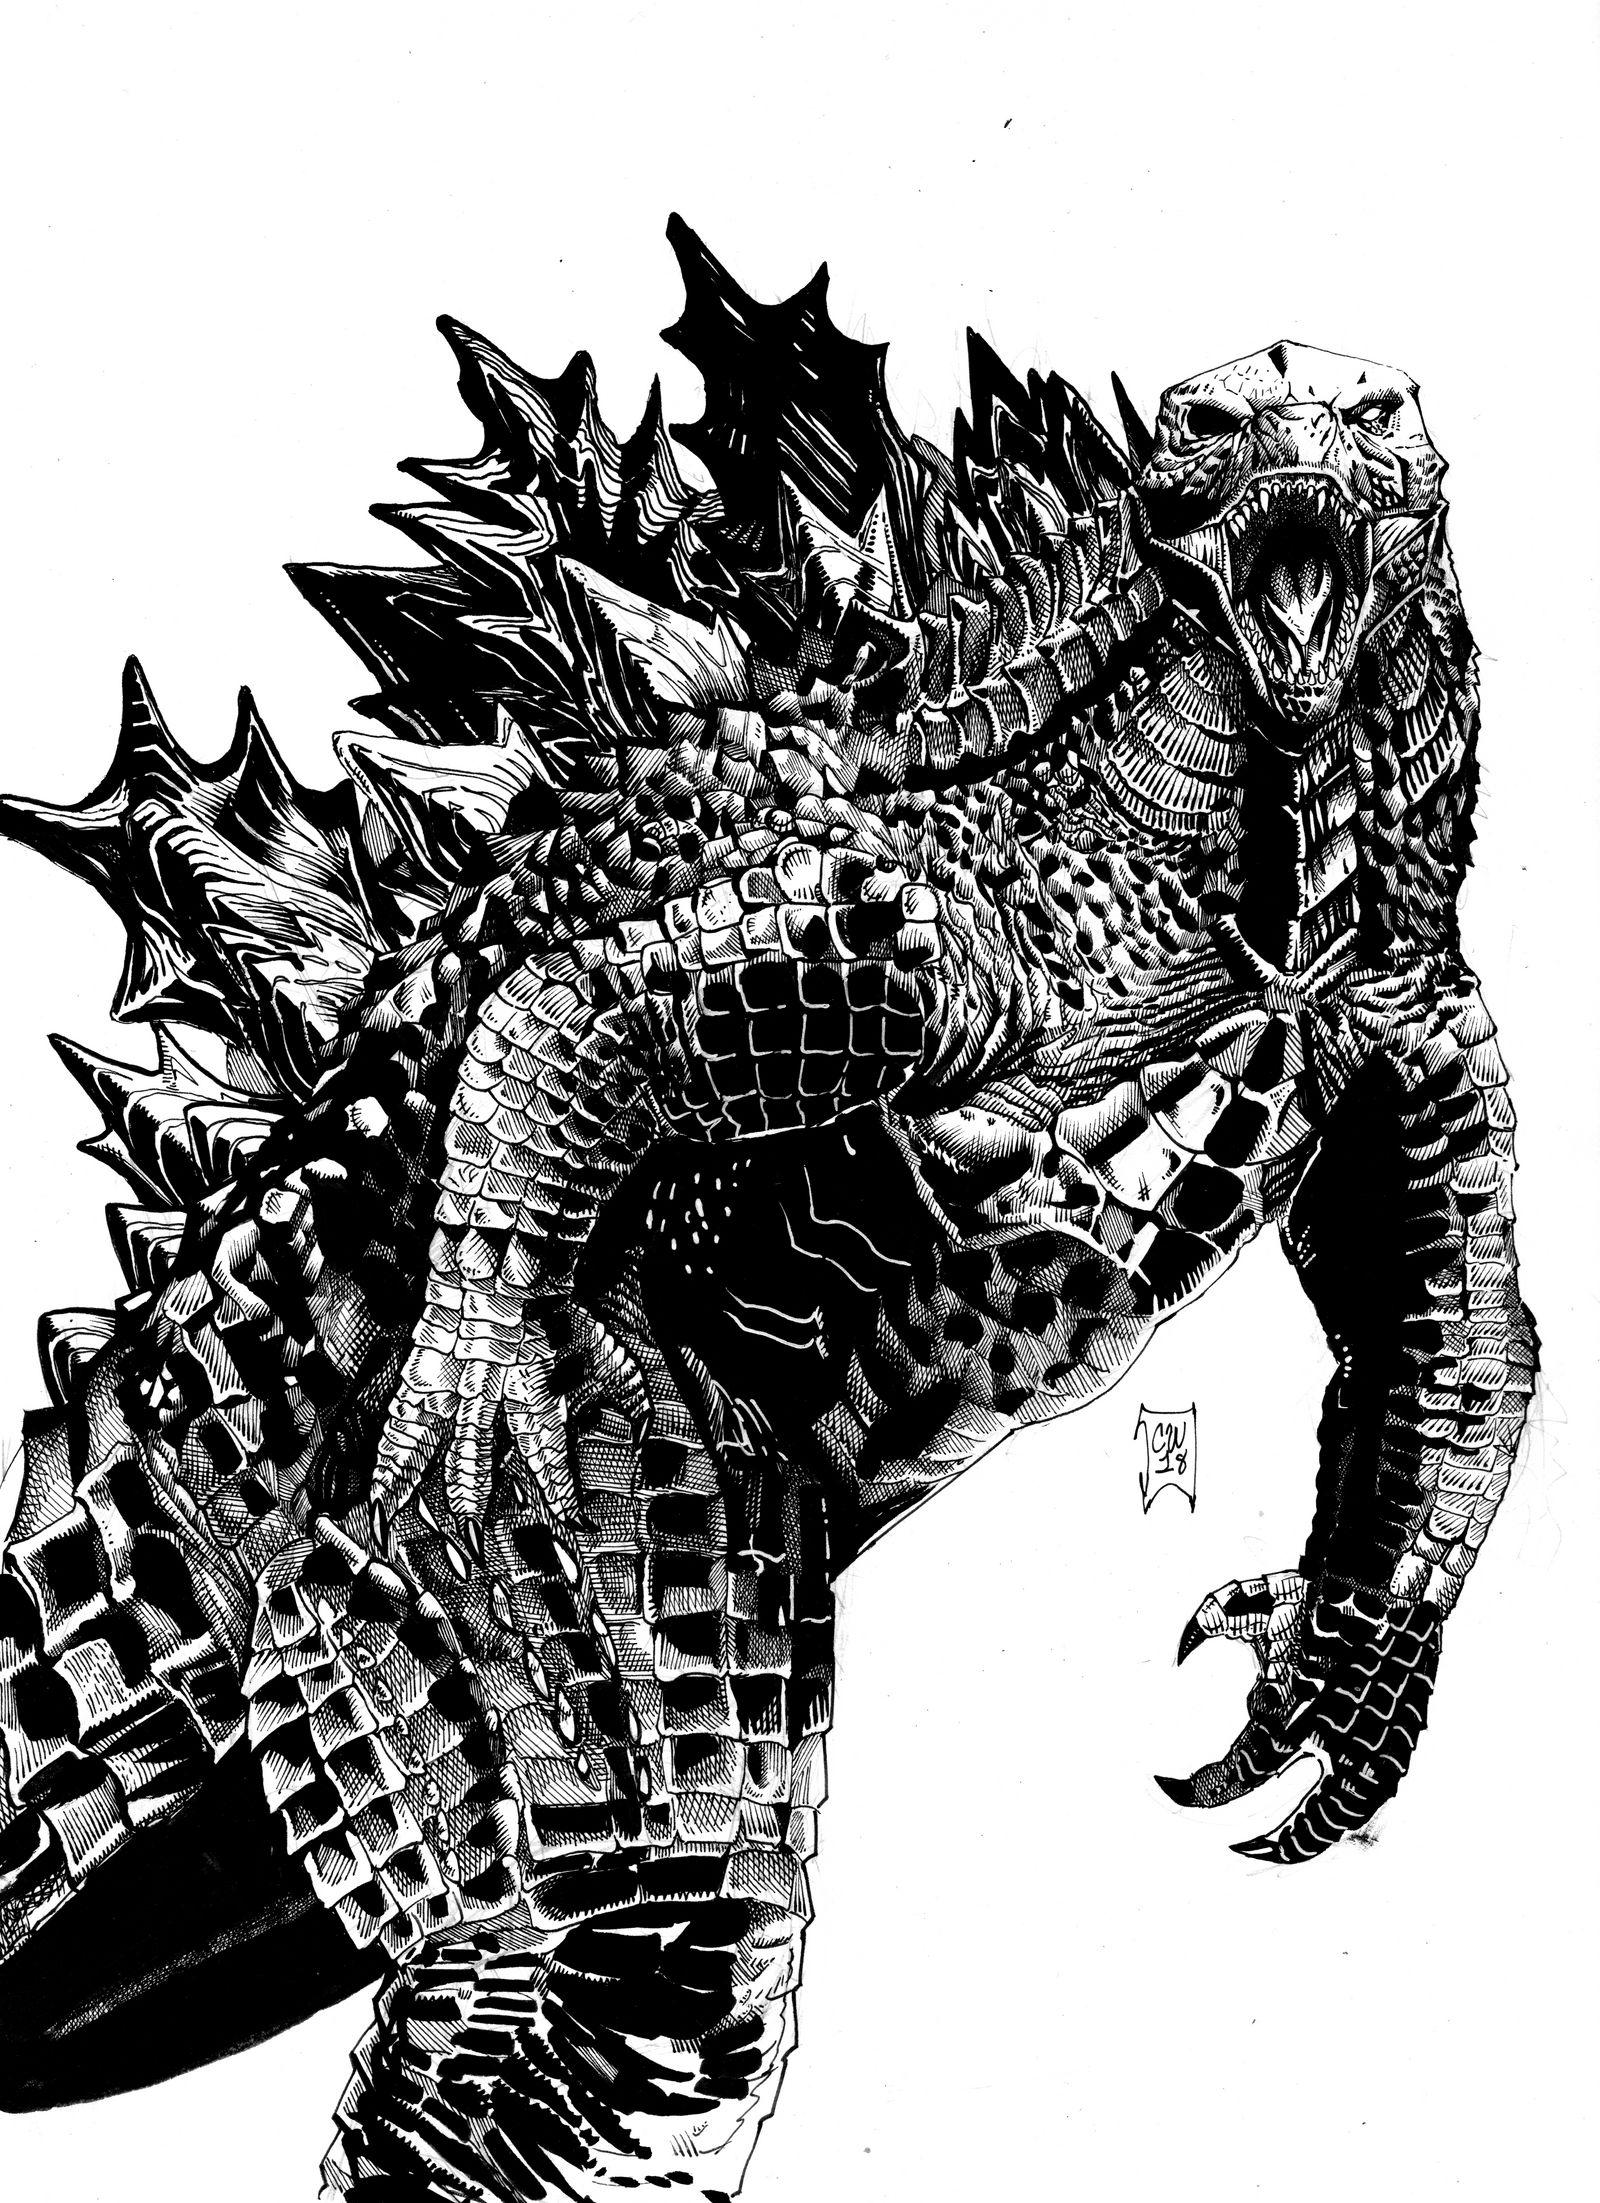 Godzilla 2019 by christianwillett on deviantart